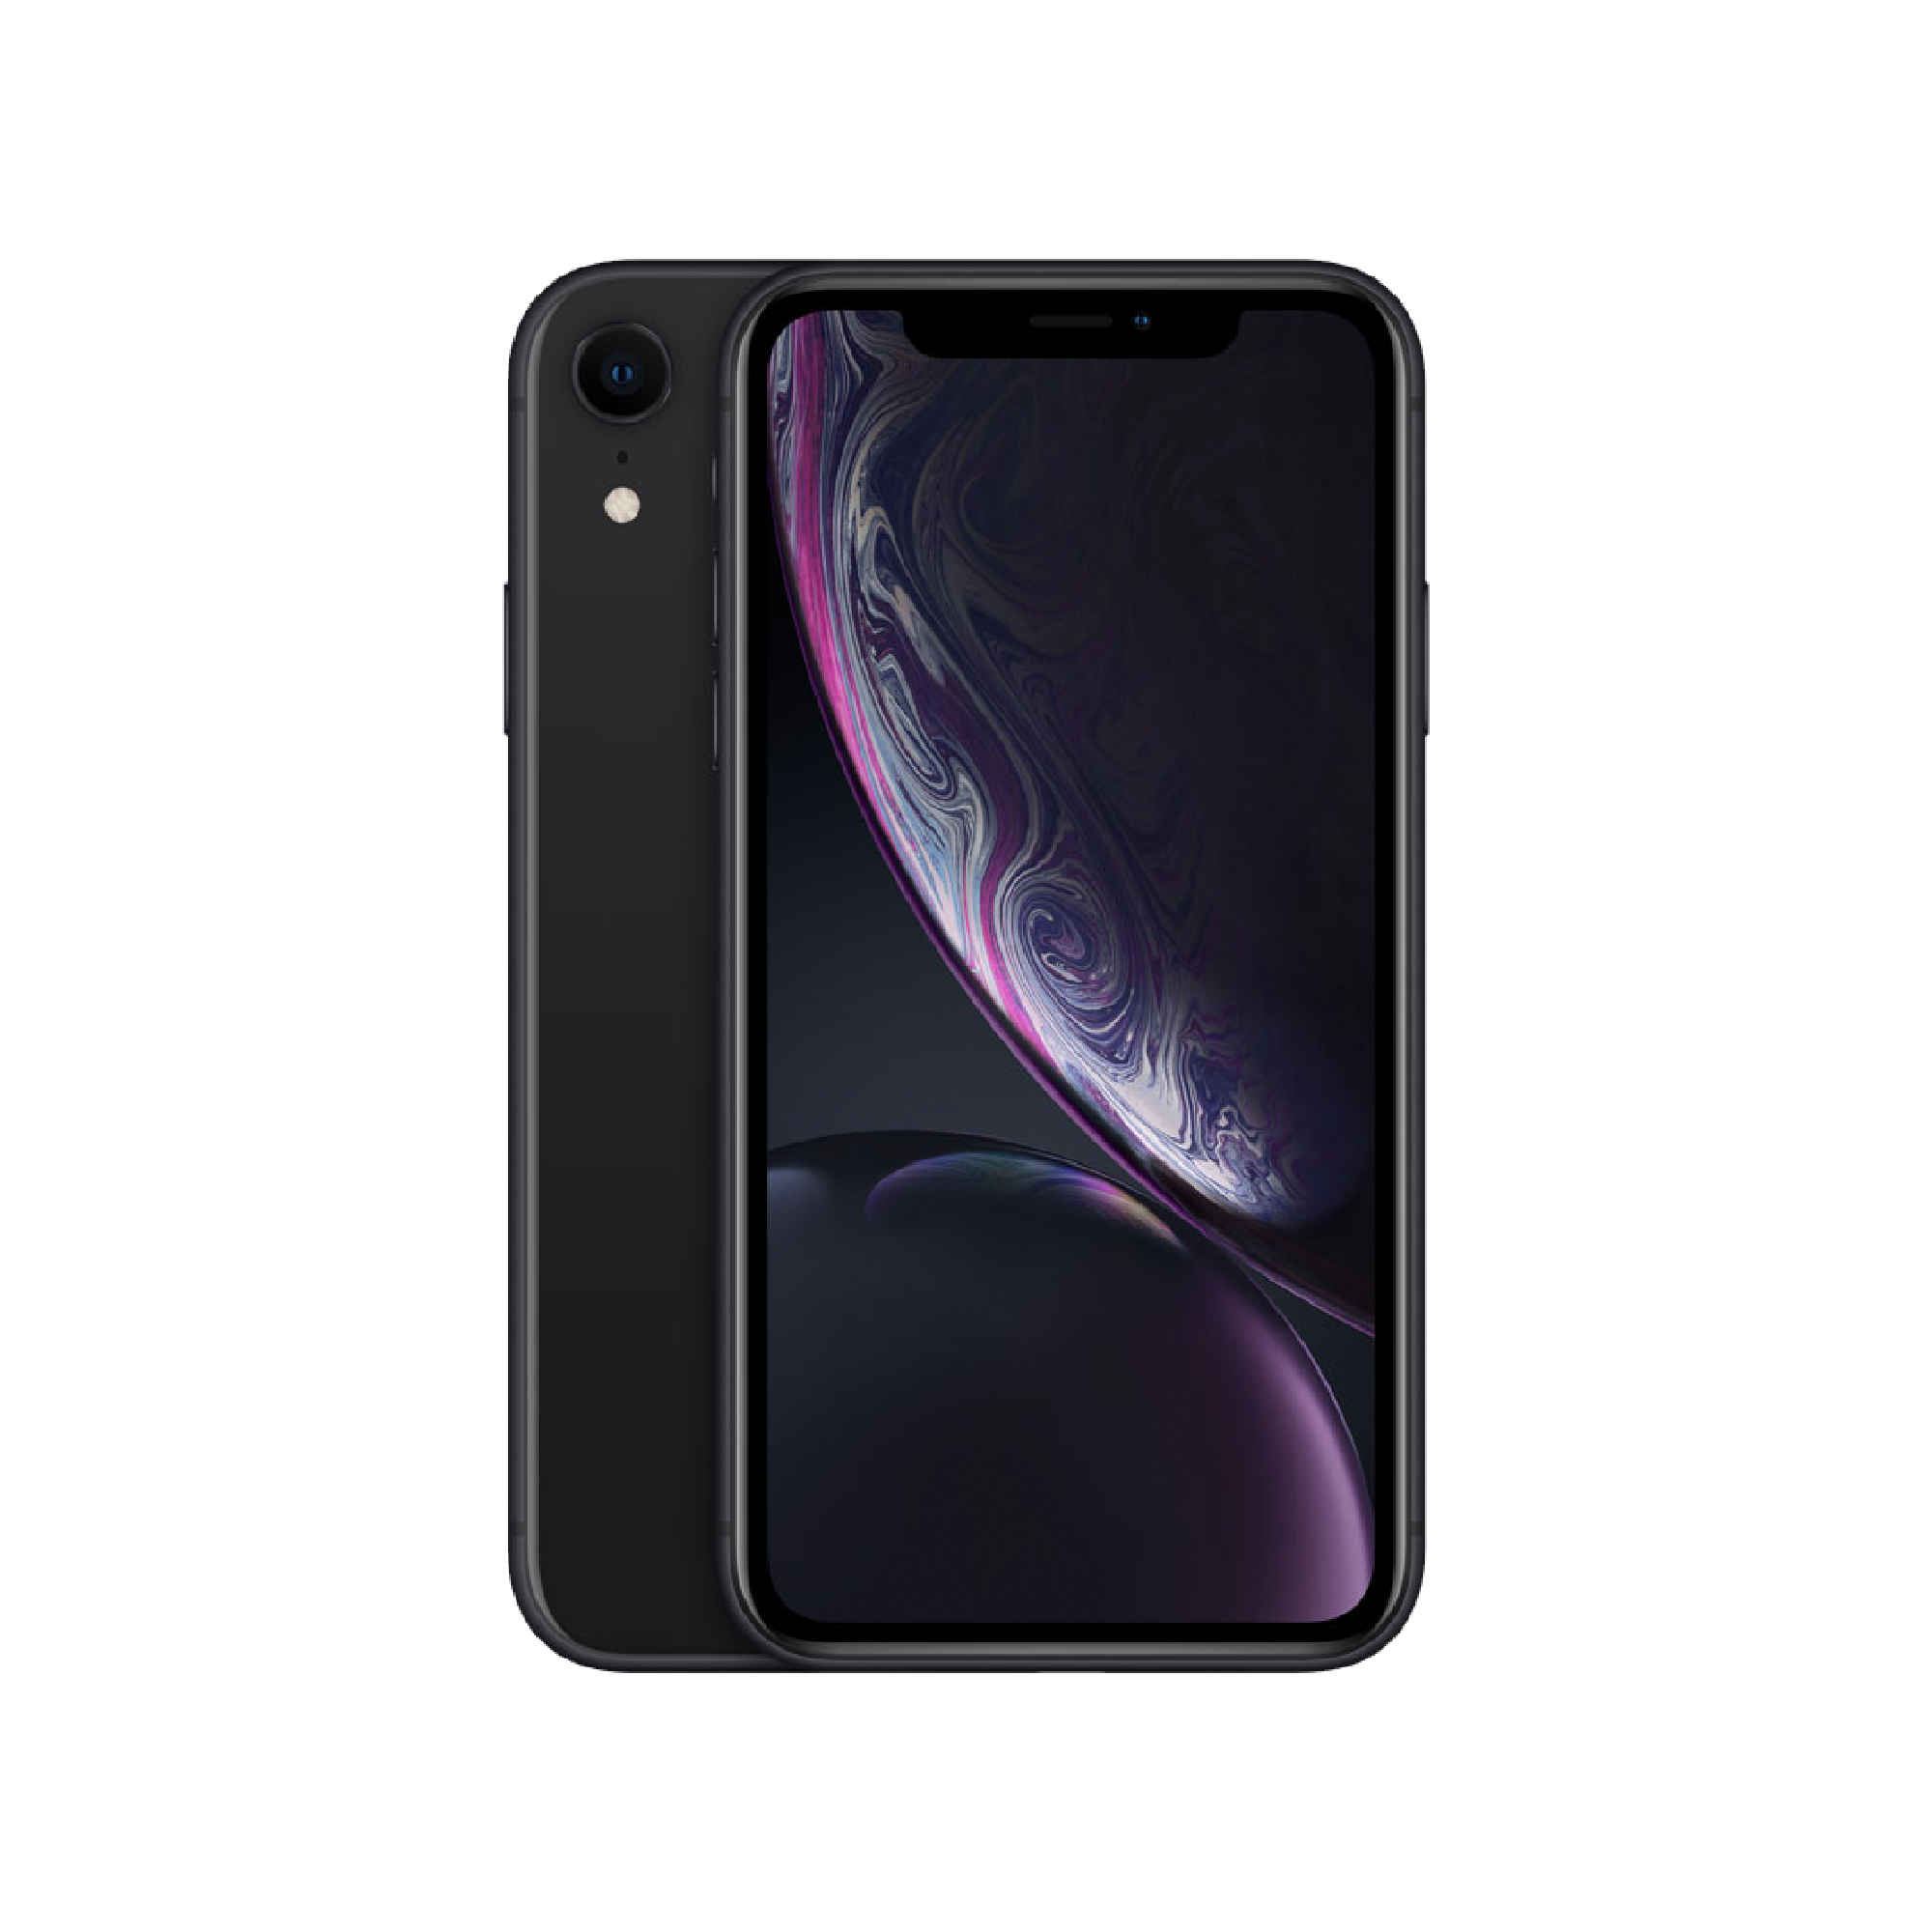 iPhone XR | $180 + tax